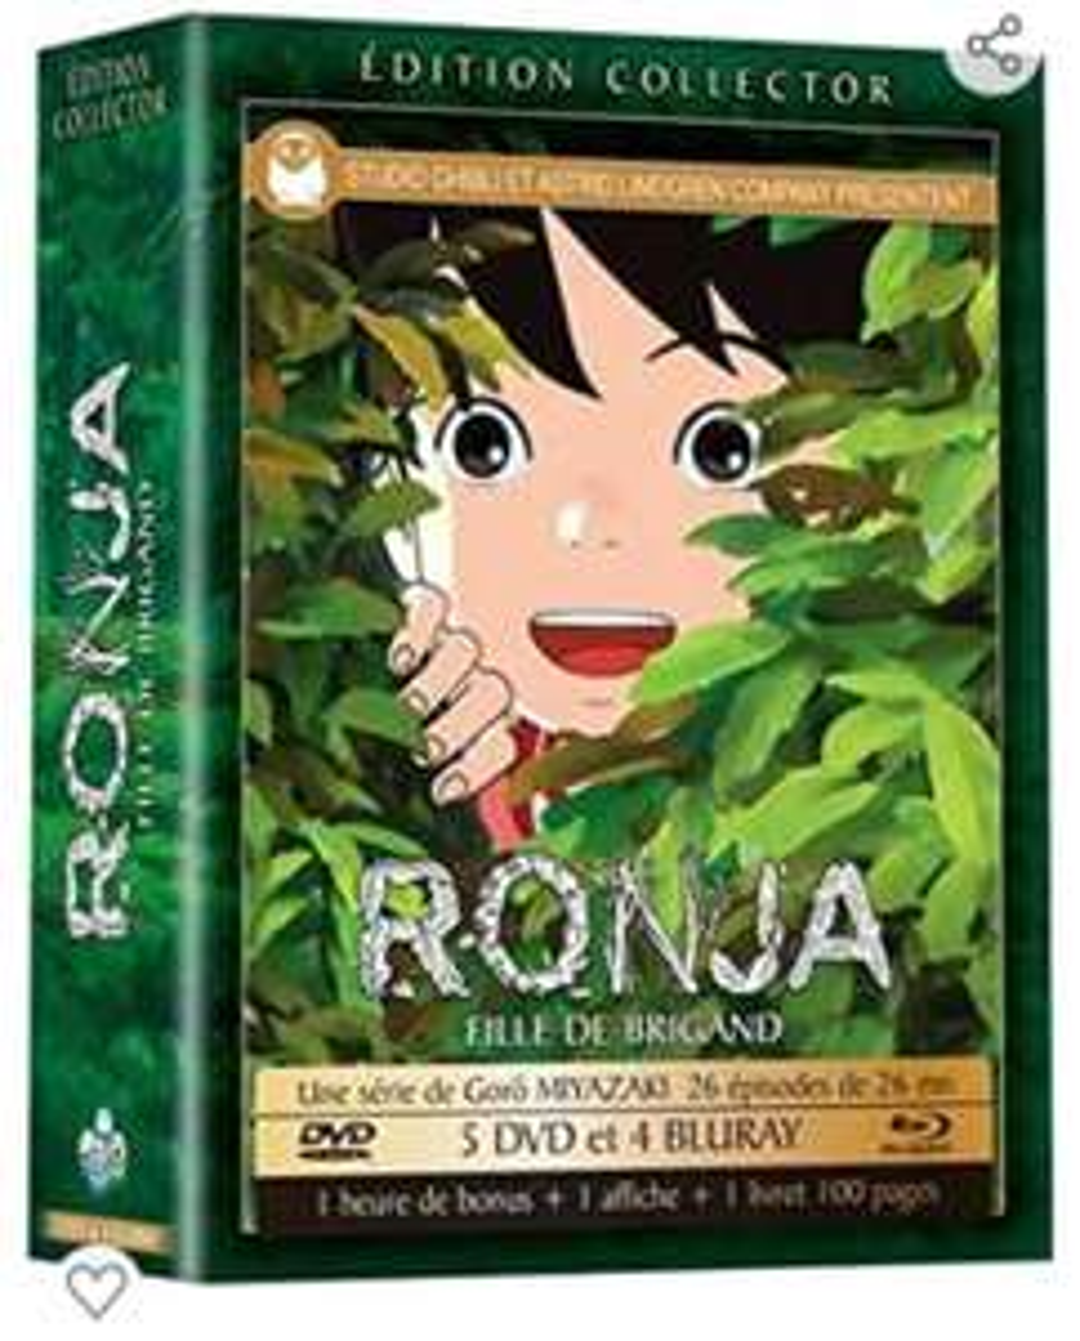 Coffret DVD + Blu-Ray Ronja, fille de brigand Edition Collector - La série complète